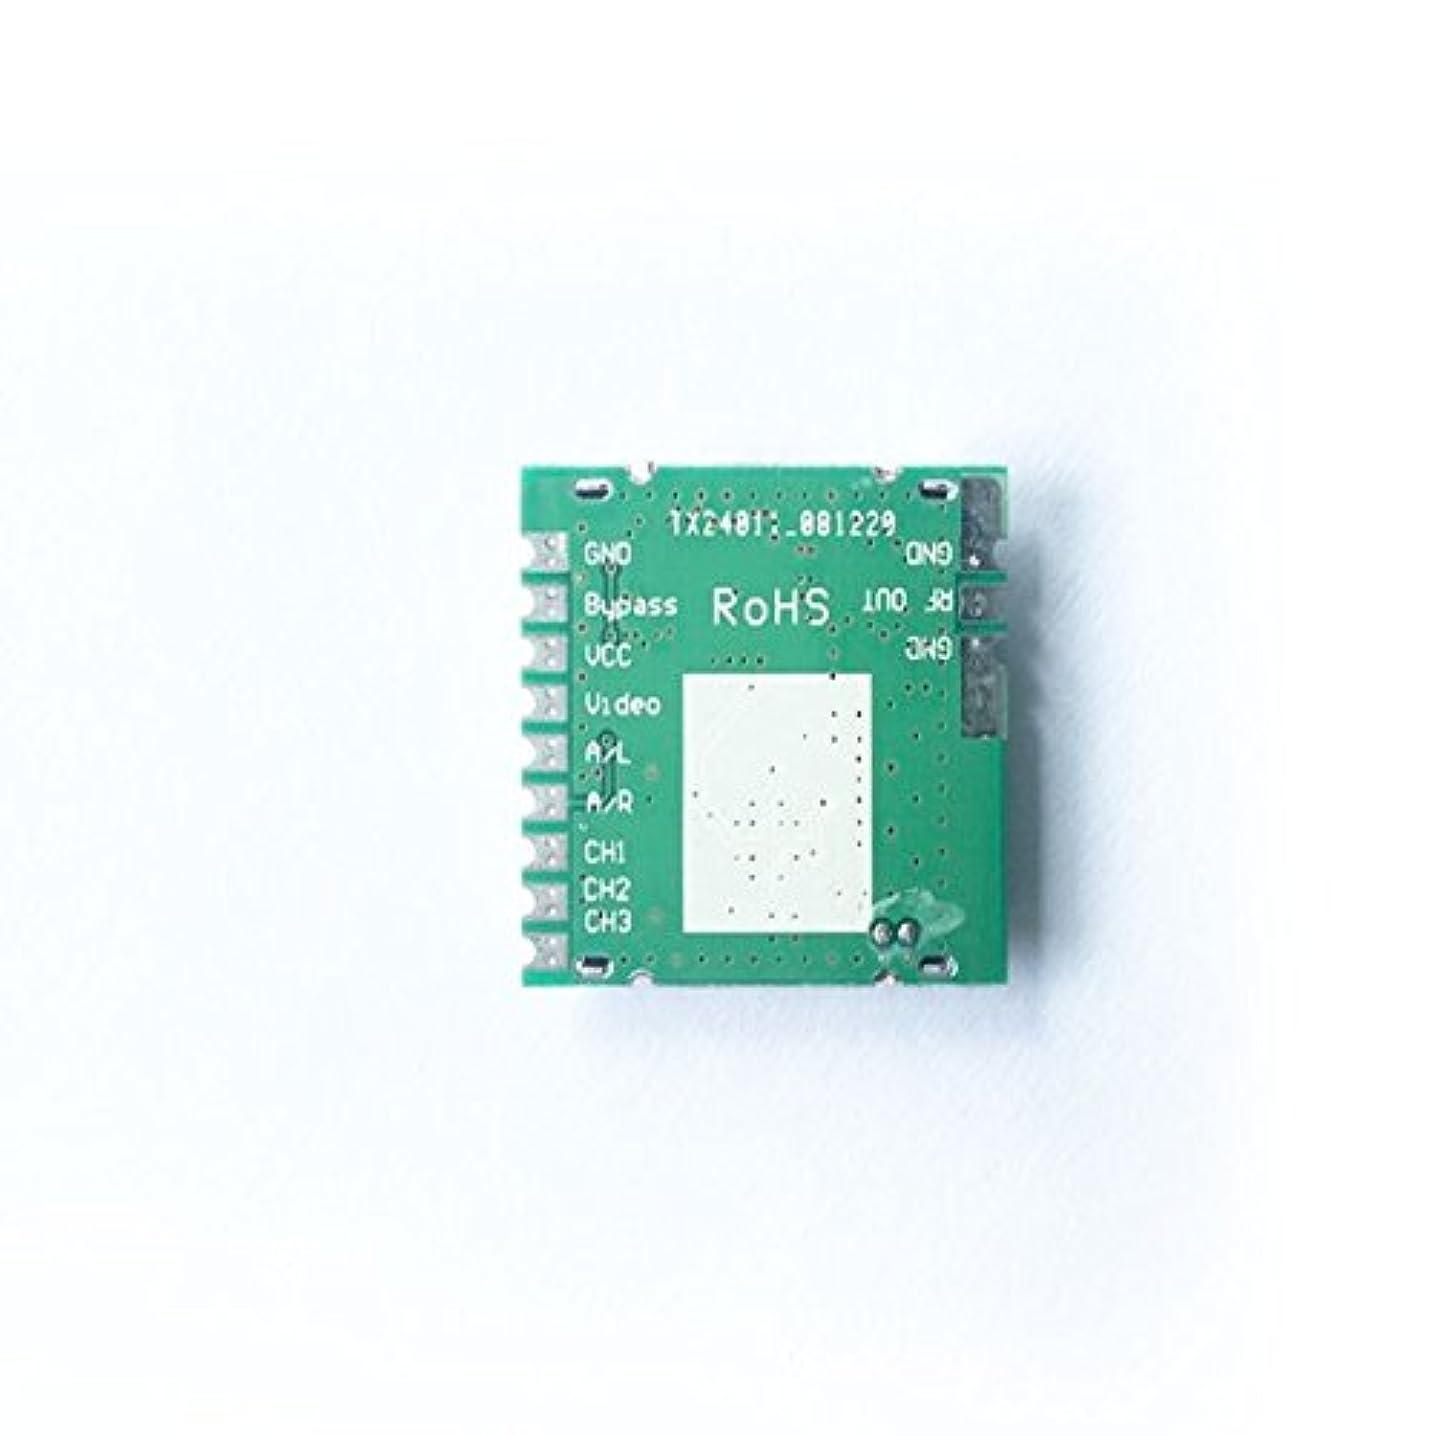 Skyzone TX24011 FPV 2.4G 4CH 160mW Wireless Audio Video Transmitter Module